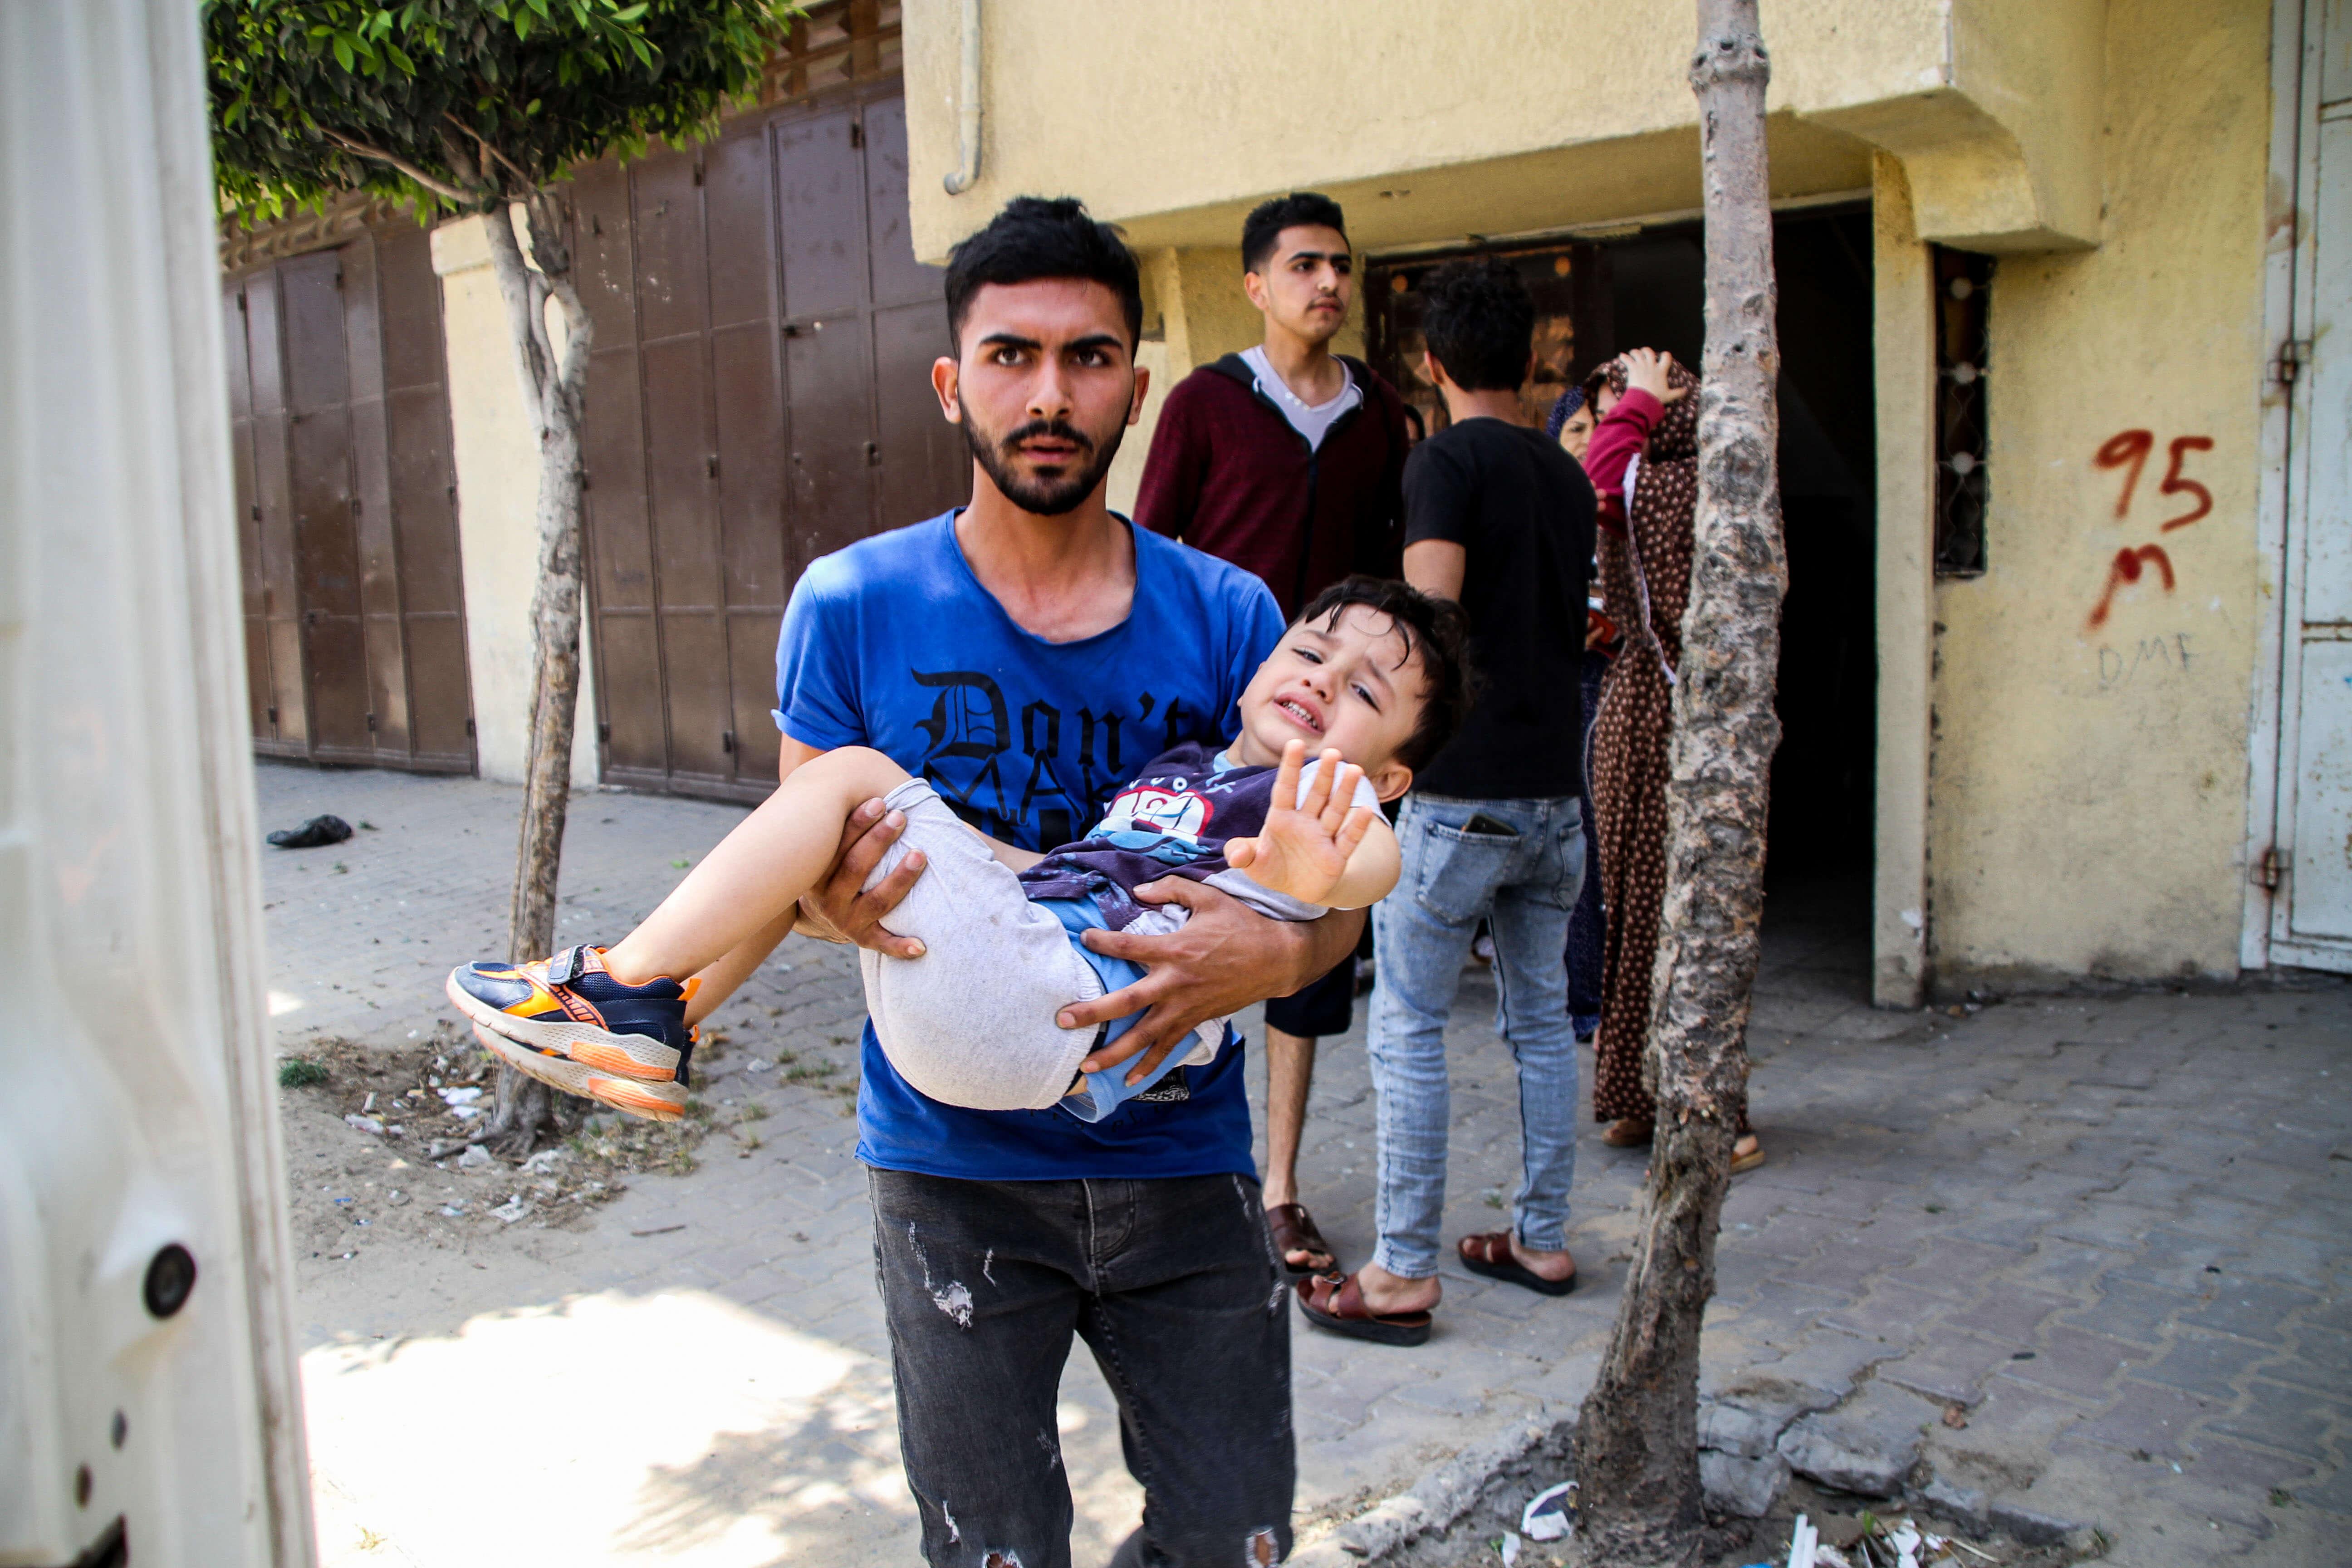 Палестинская территория. Ahmad Hasaballah / Keystone Press Agency / Global Look Press